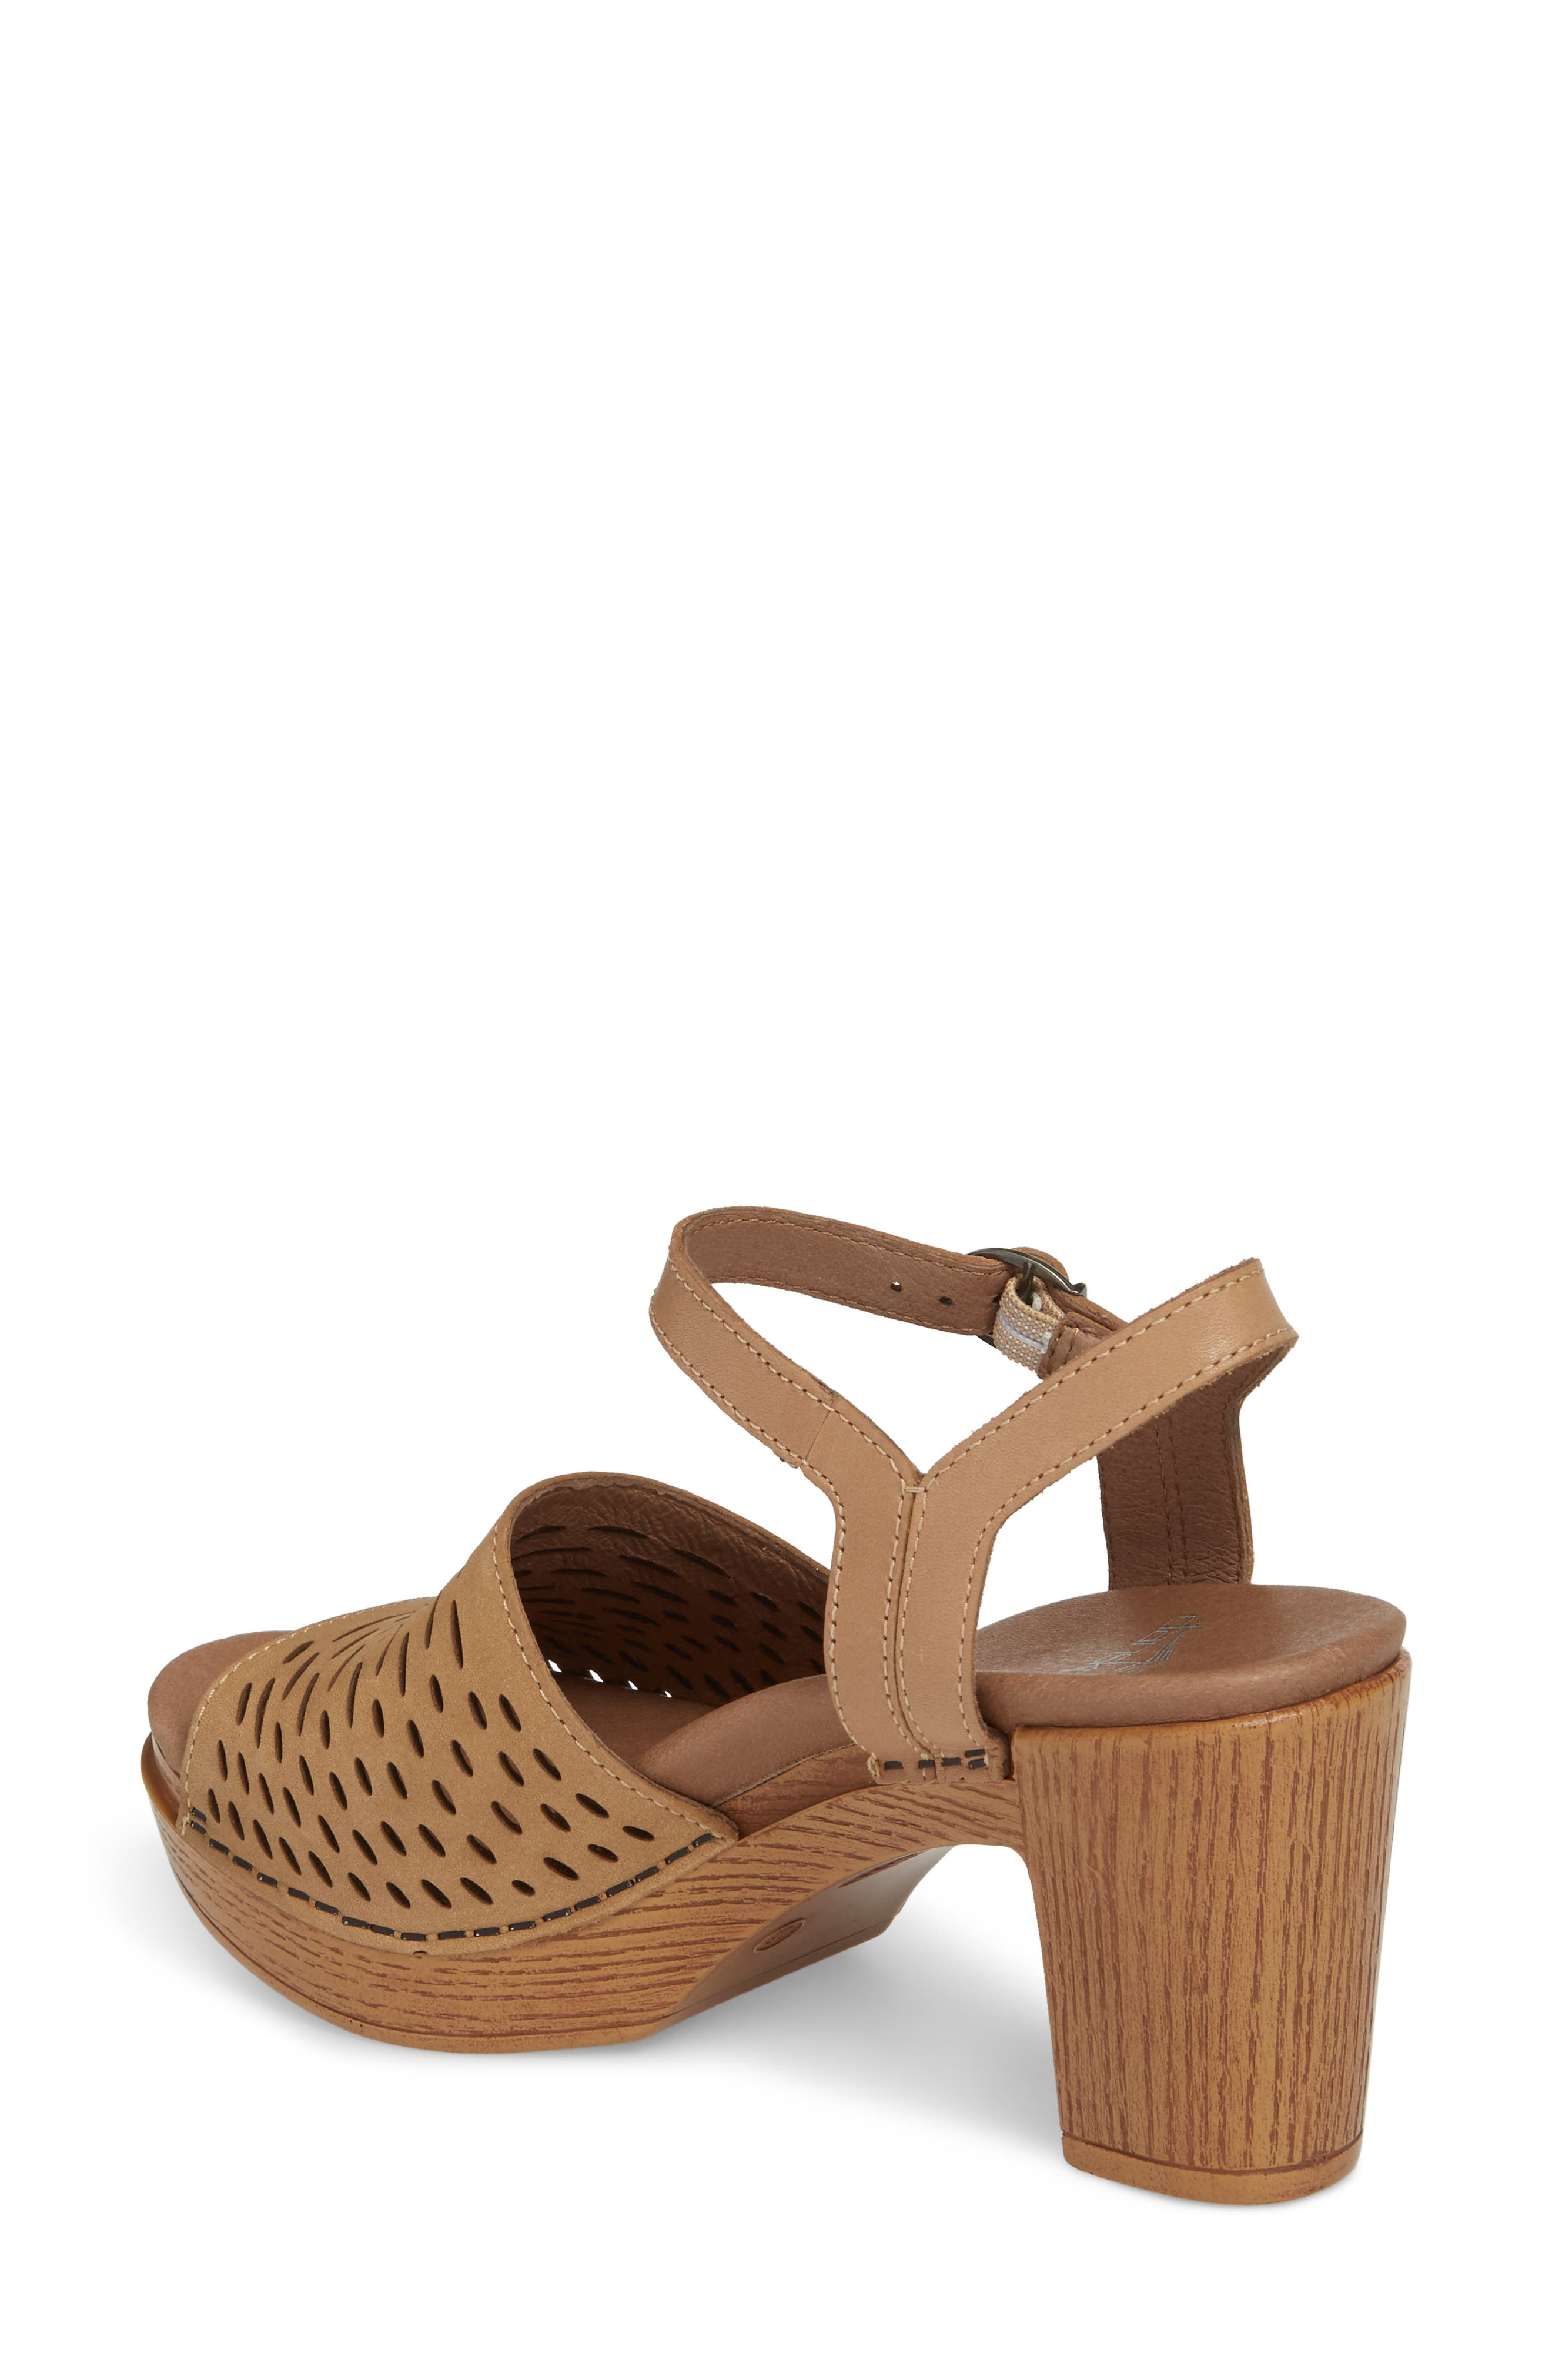 Denita Block Heel Sandal,                             Alternate thumbnail 2, color,                             SAND MILLED NUBUCK